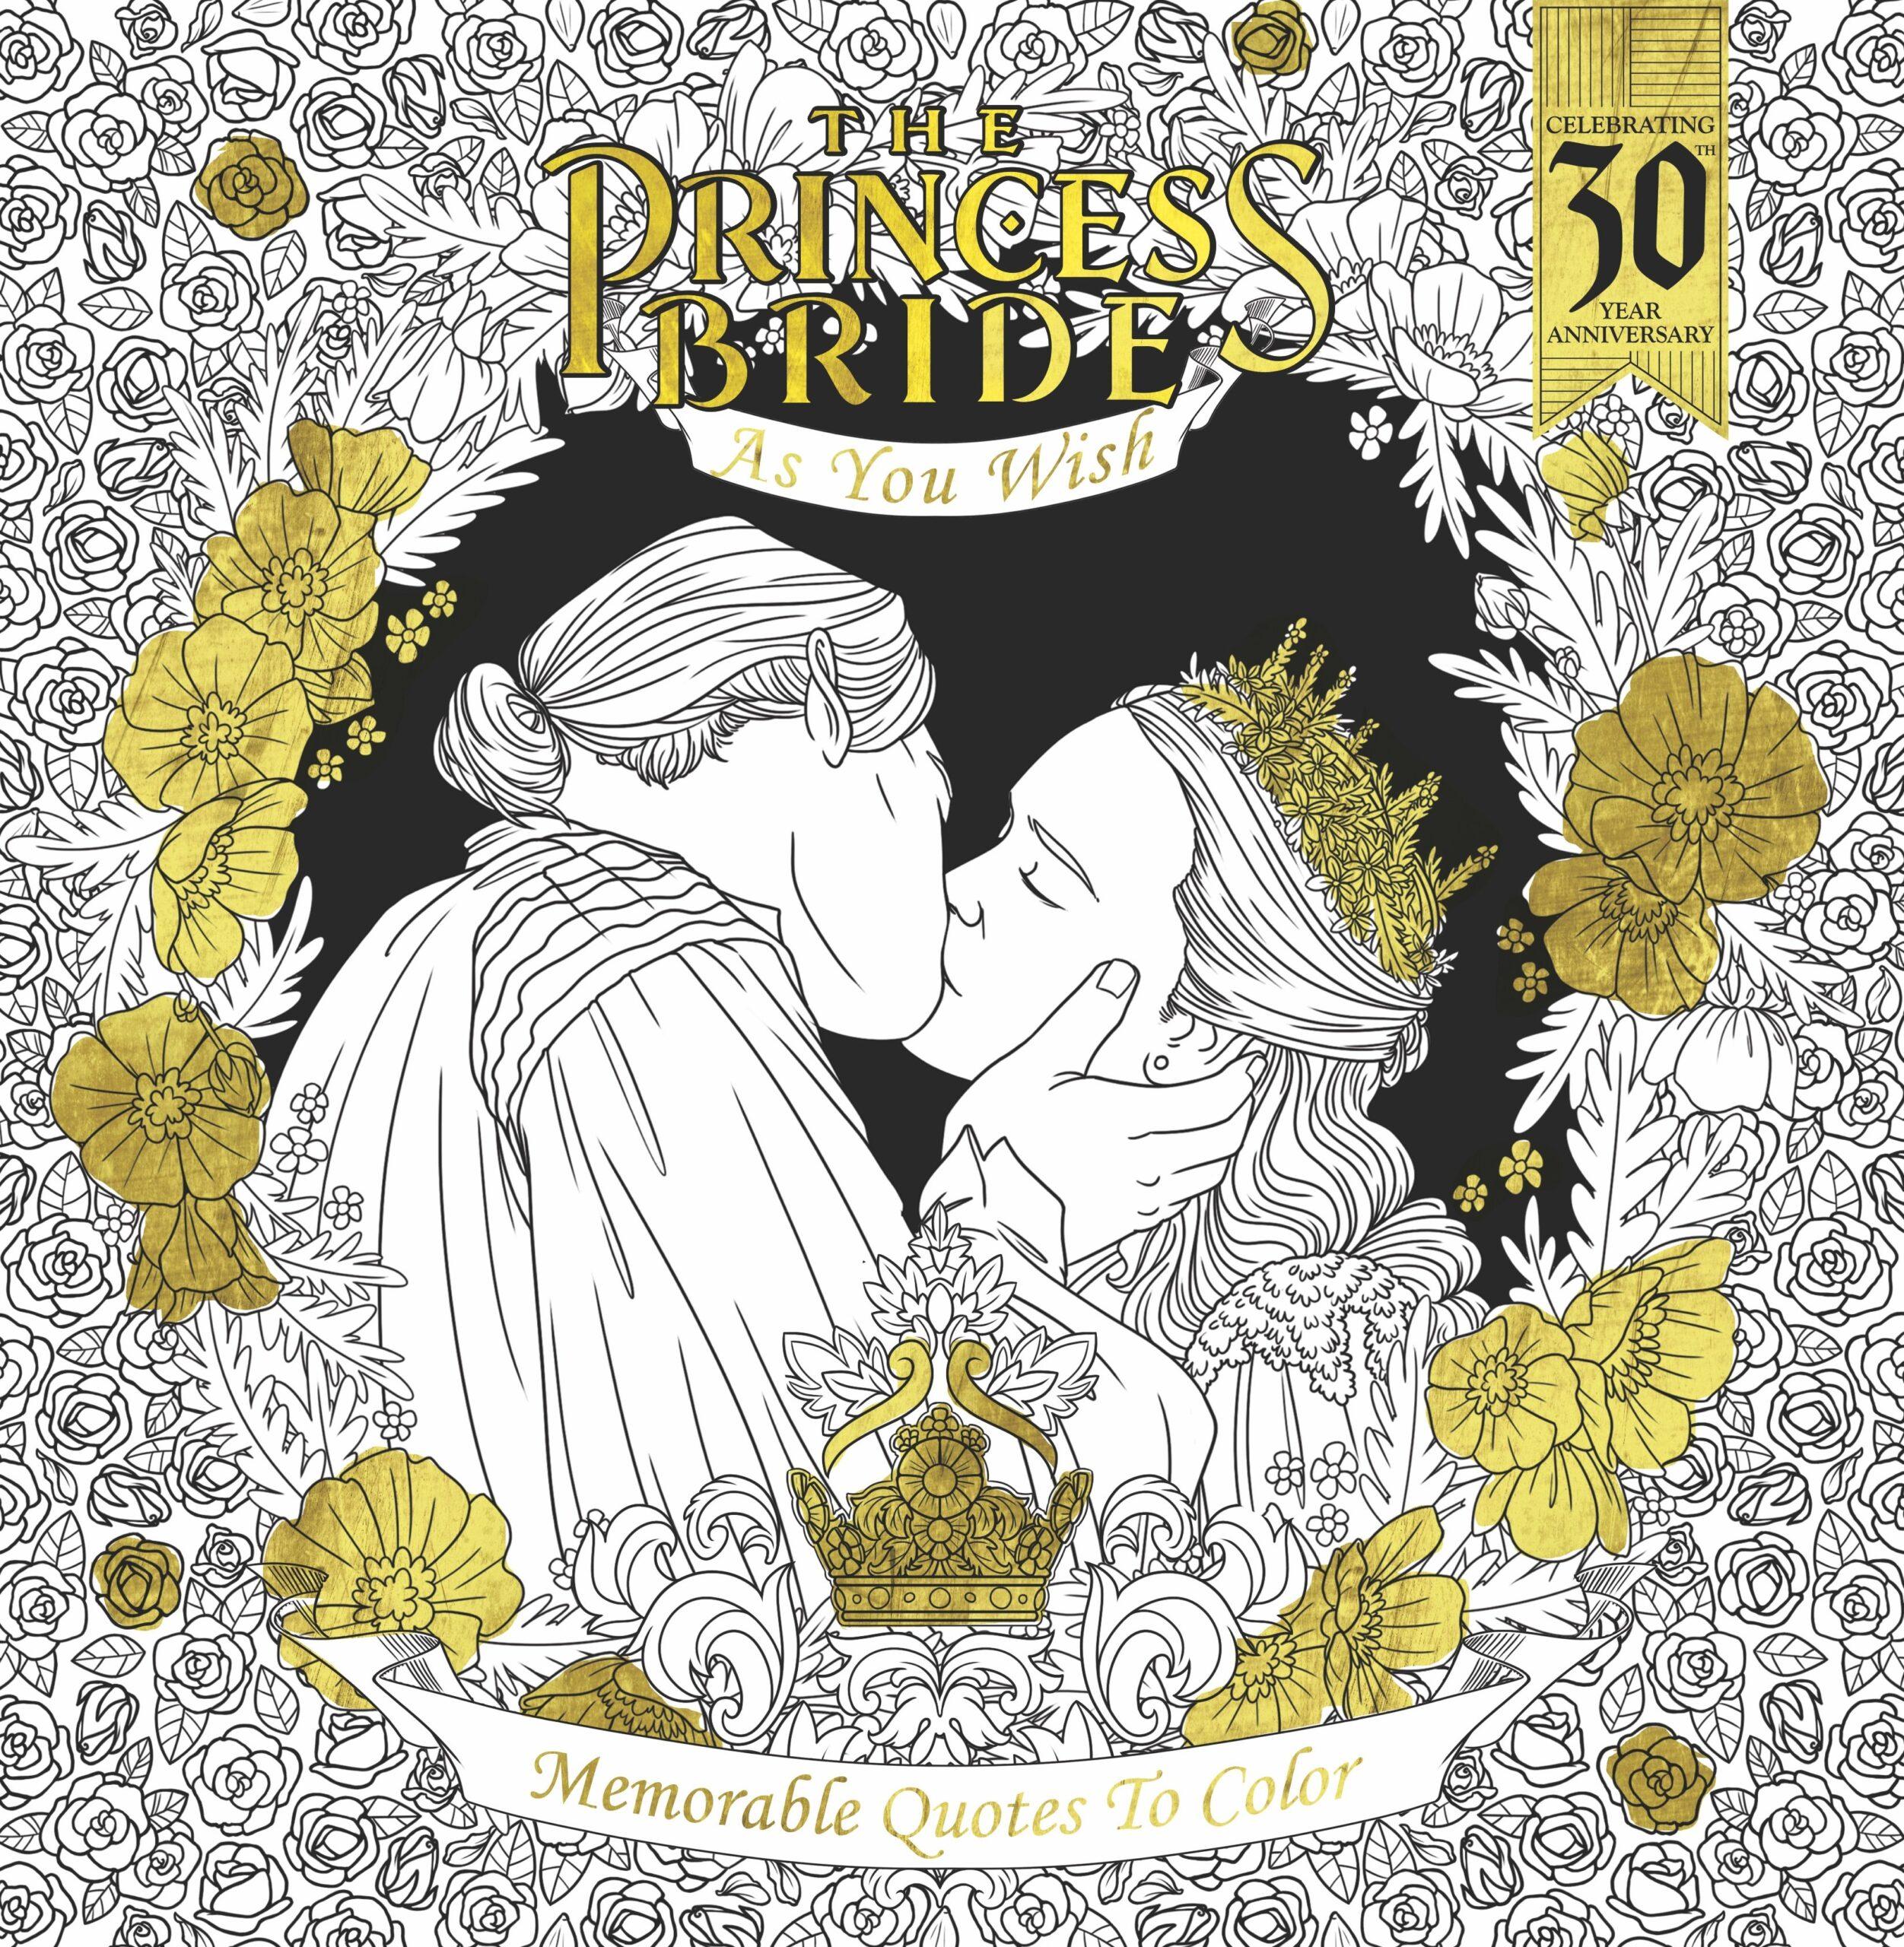 coloring pages princess bride - photo#30